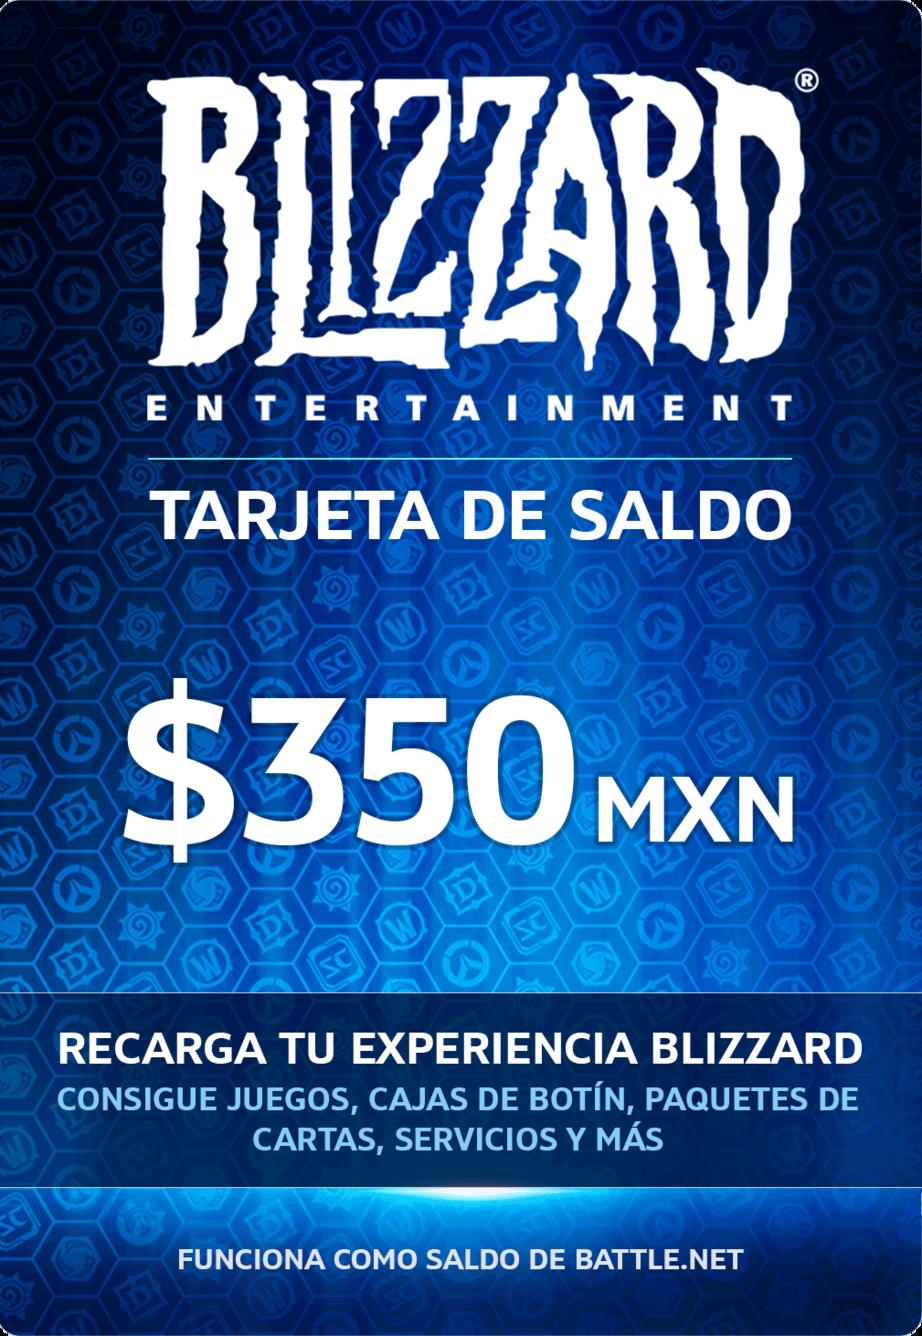 Blizzard Tarjeta de saldo 350 MXN